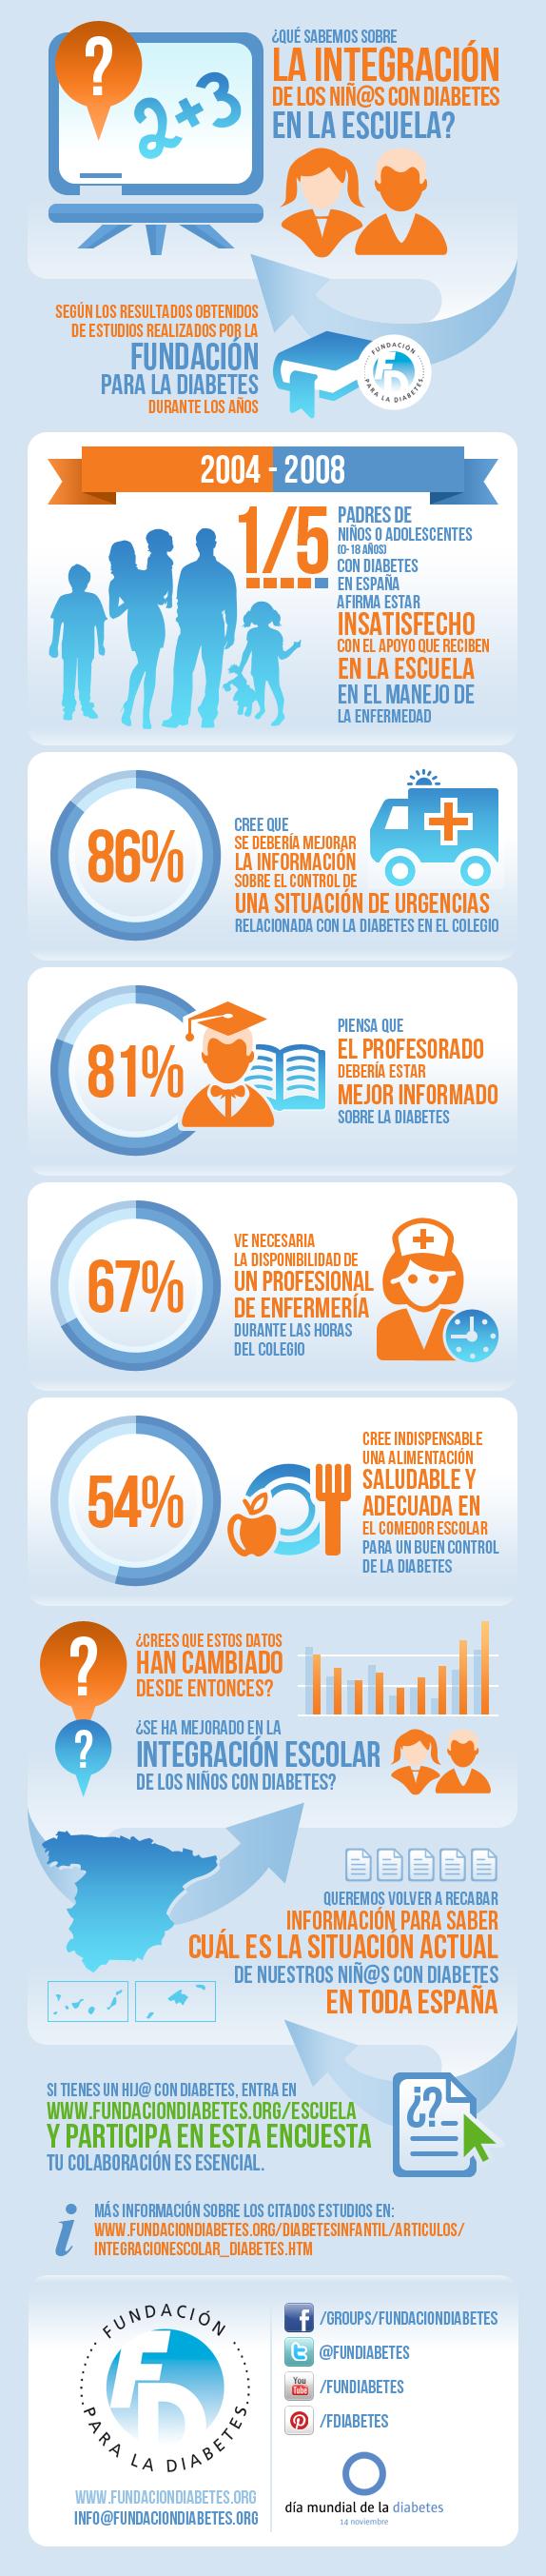 InfografiaFD_diabetes_escuela